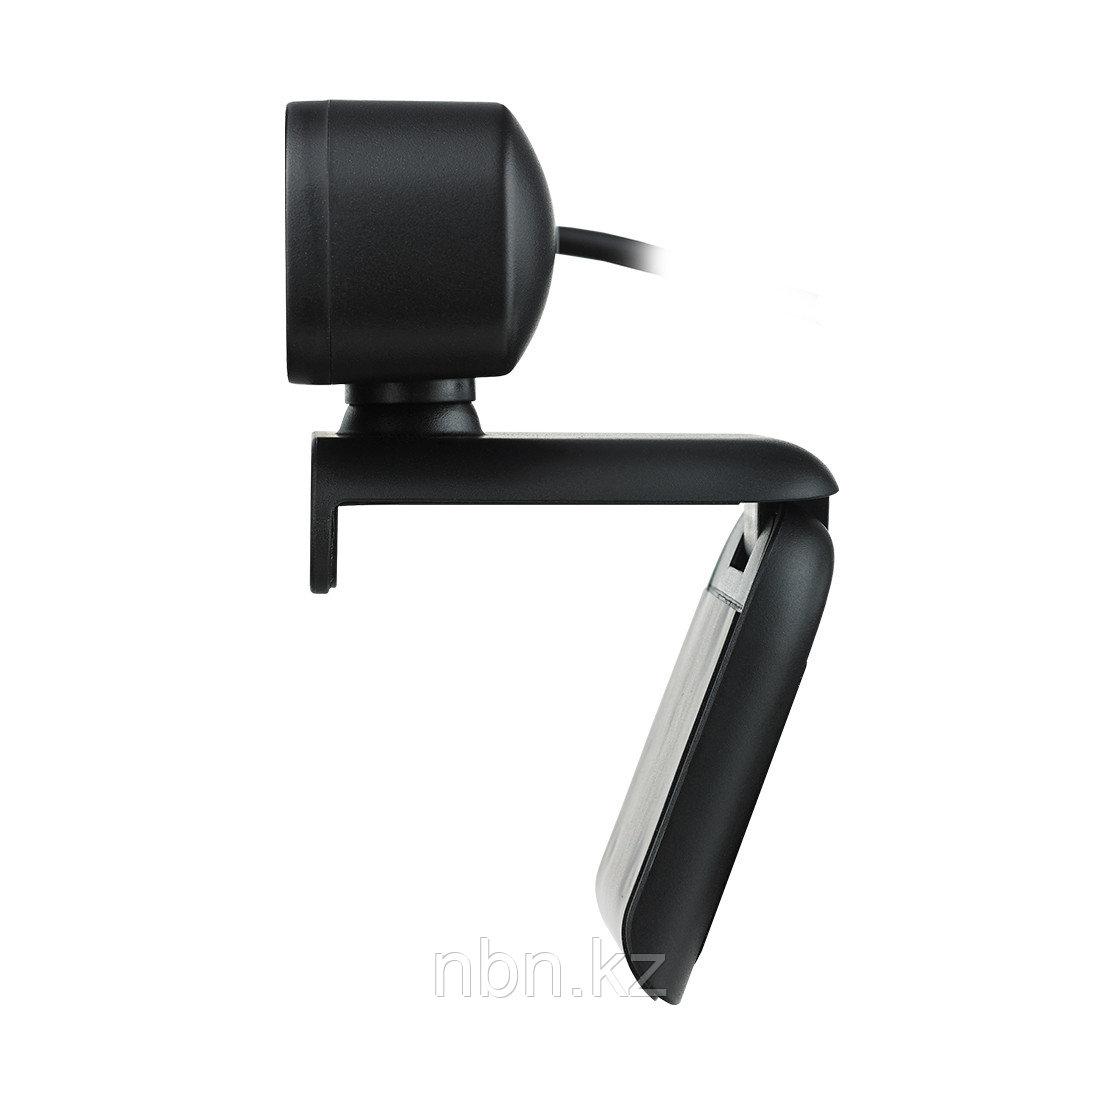 Веб-Камера Rapoo C260 - фото 3